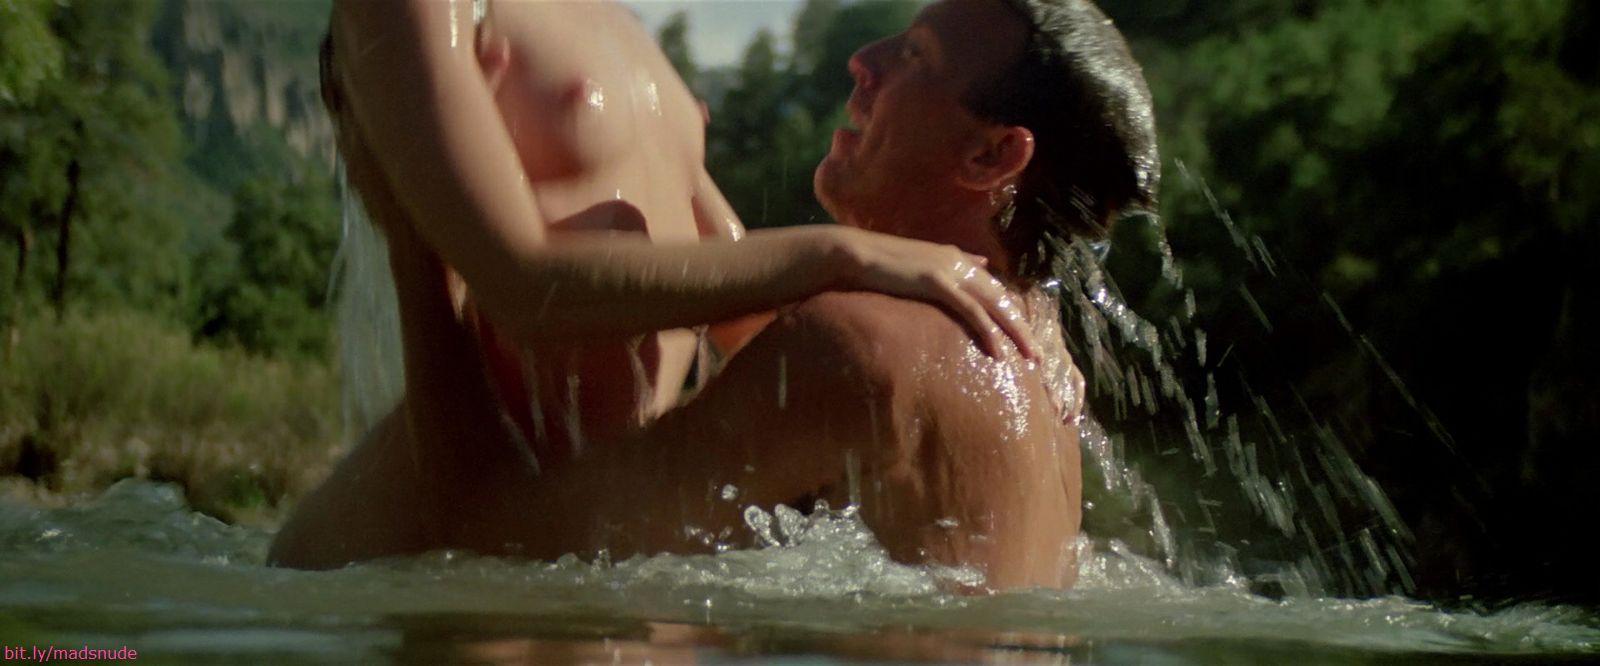 Madeline stowe nude